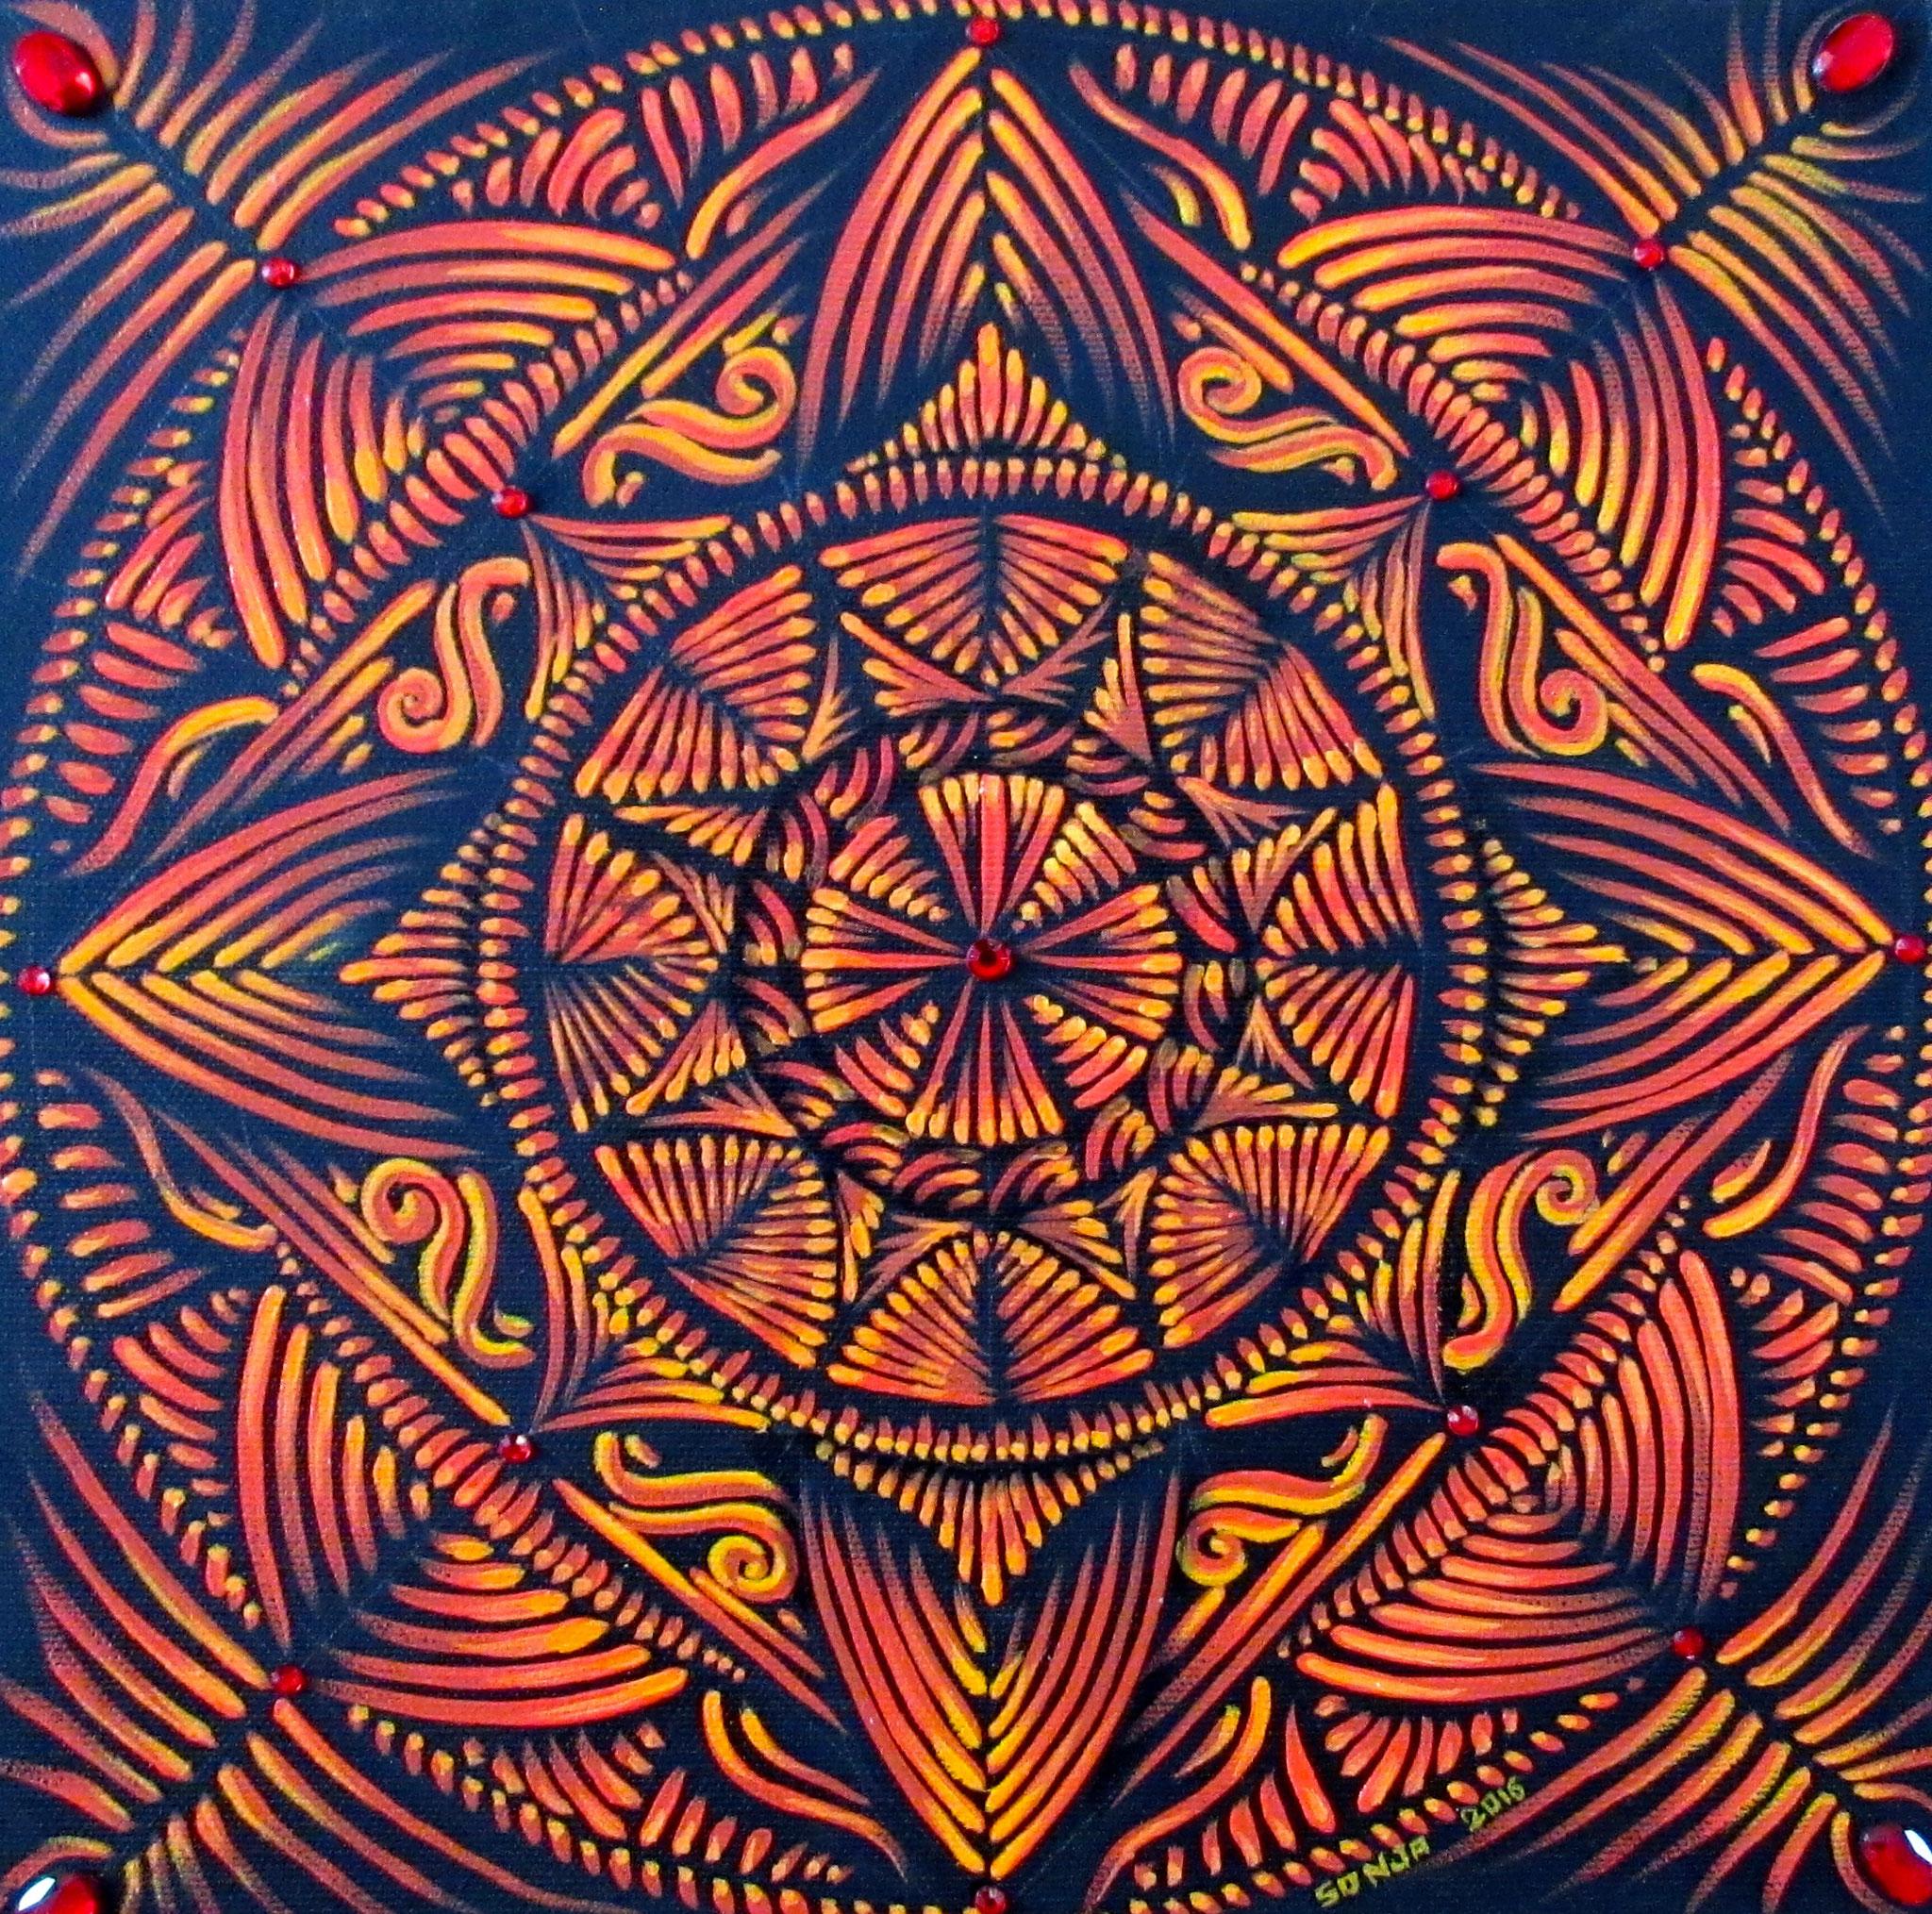 Chakra Mandala - Root Chakra - oil on canvas 12x12, Nov.2016 - (1)